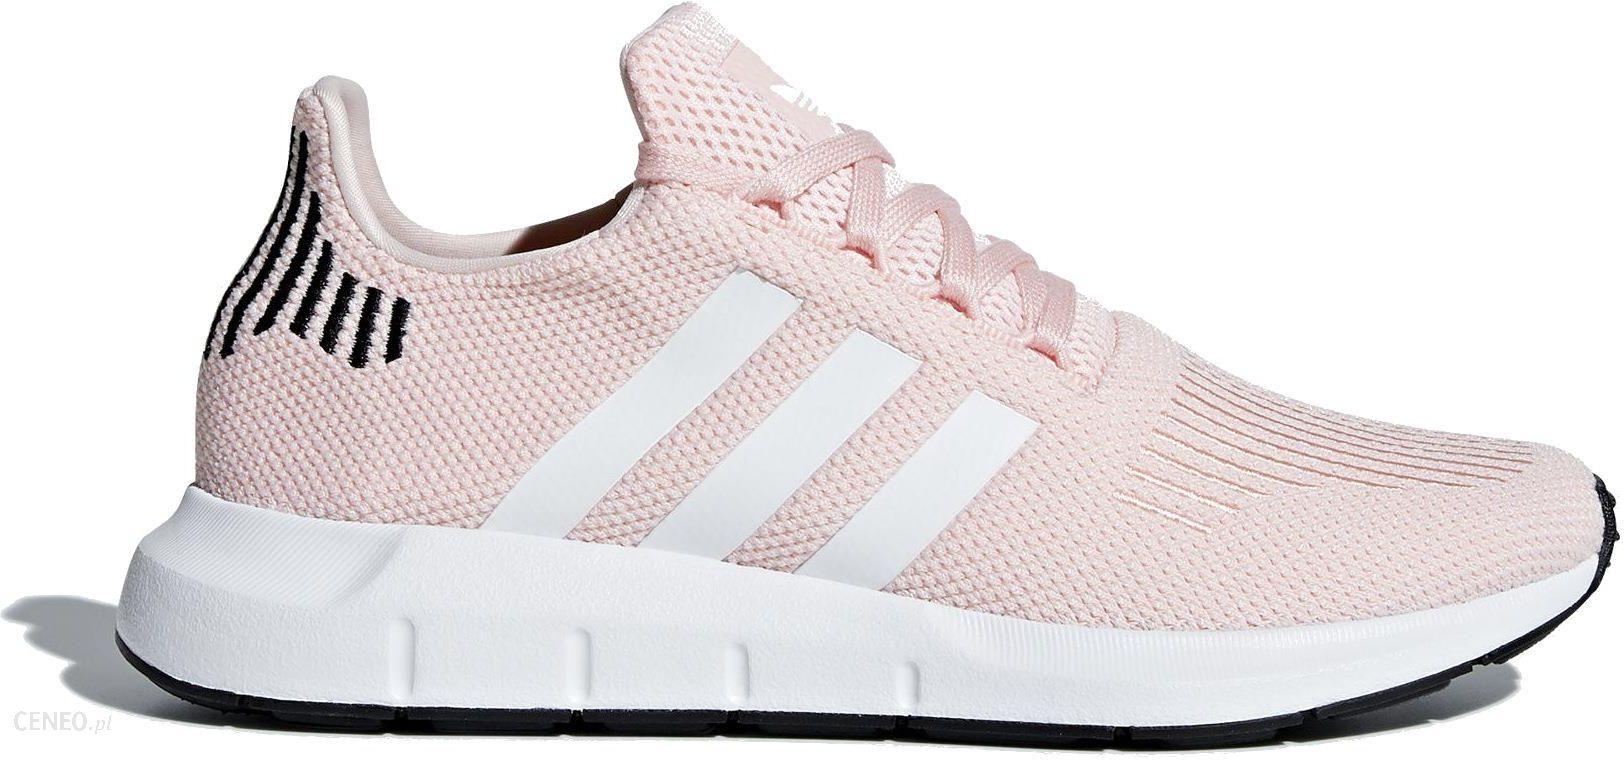 Buty damskie sneakersy adidas Originals Swift Run B37681